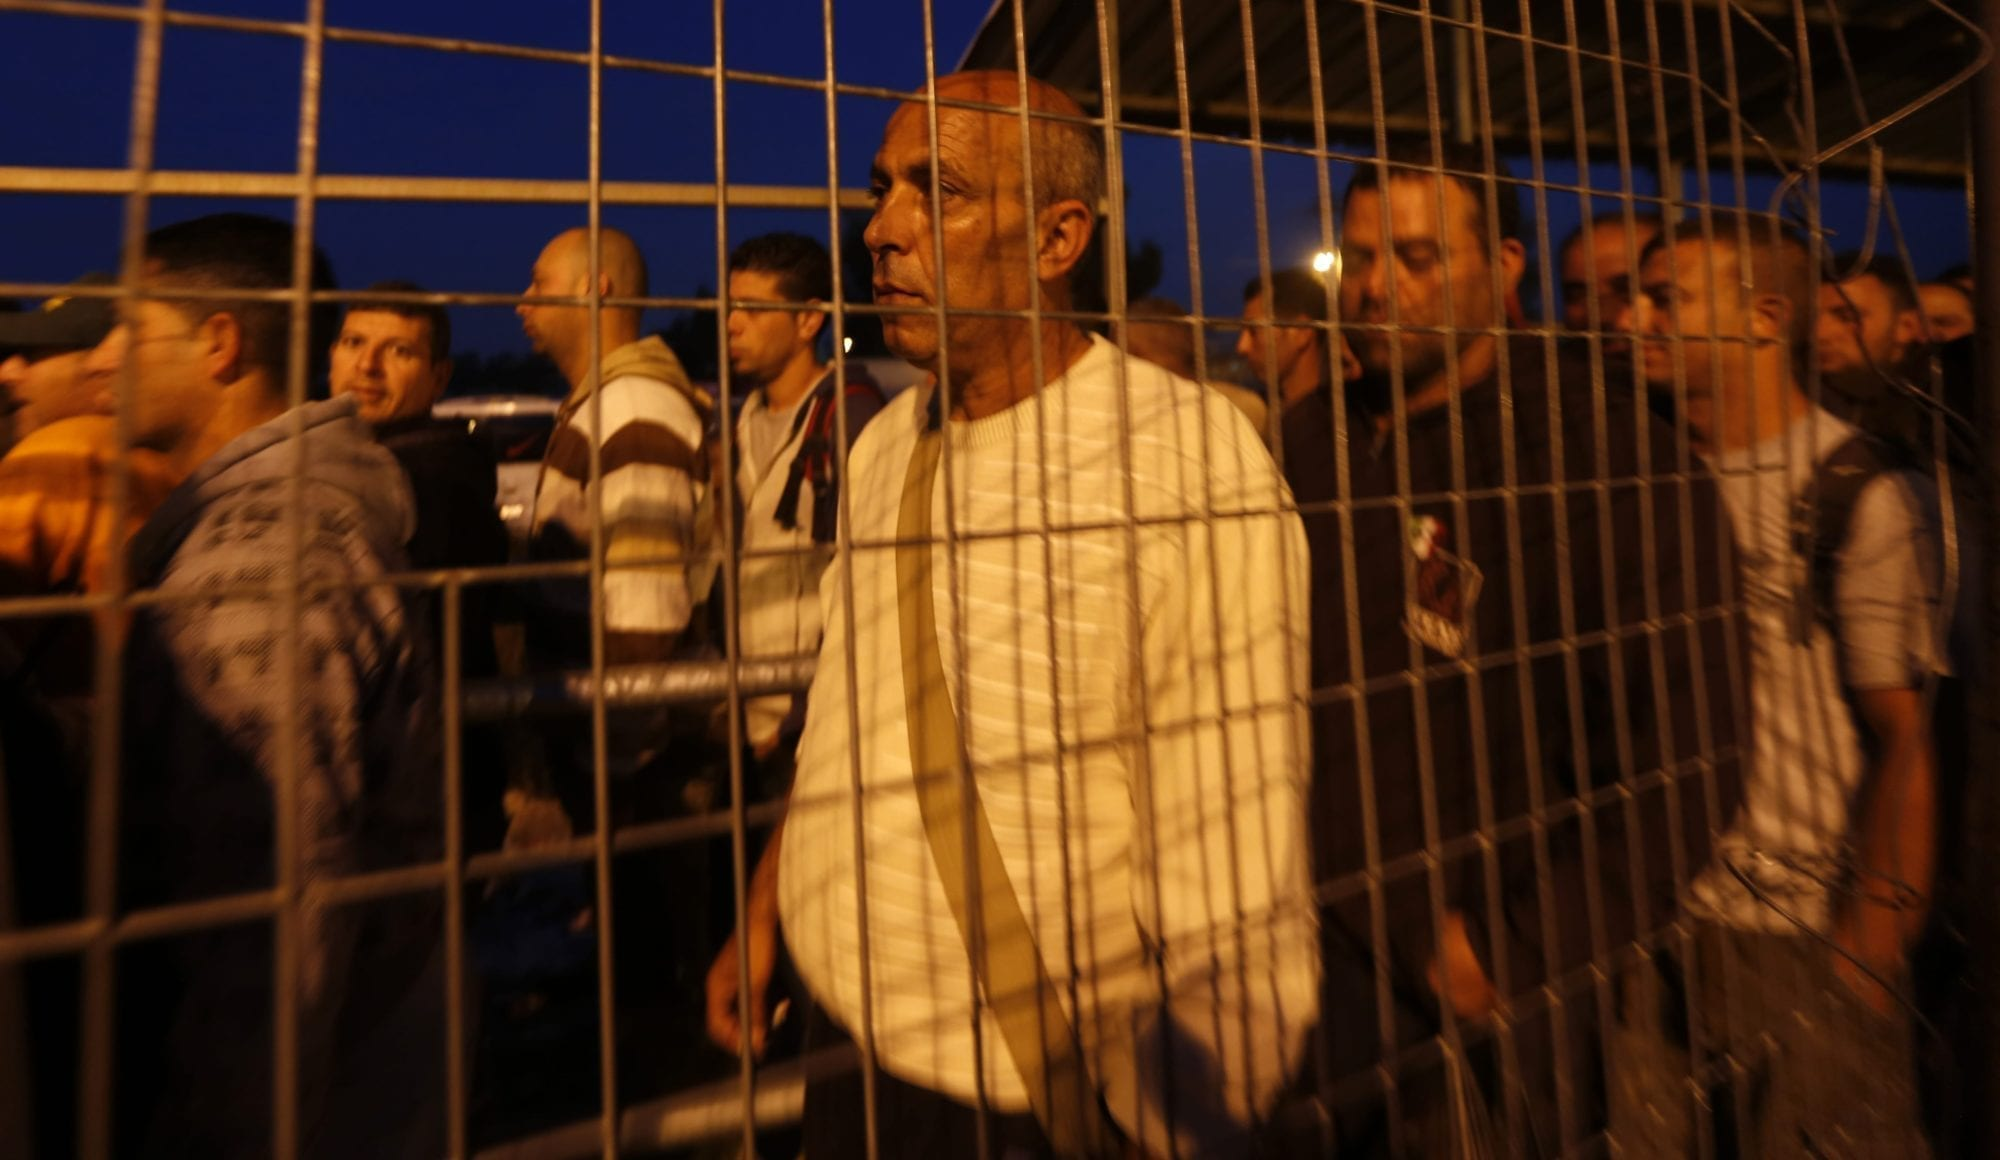 Palestine, Israeli border crossing, Solidarity Center